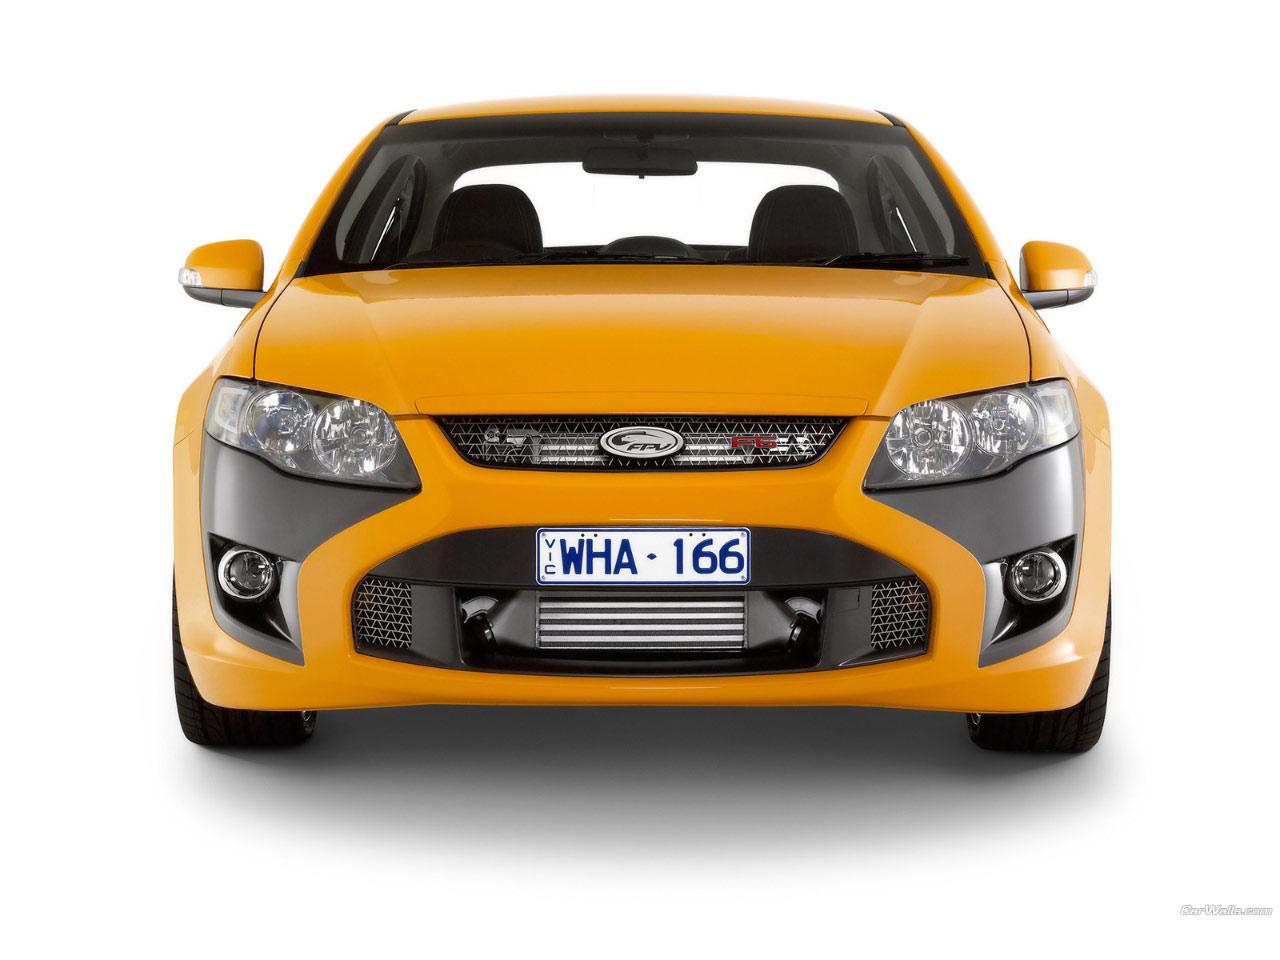 Ford_FPV_F6_632_1280x960.jpg